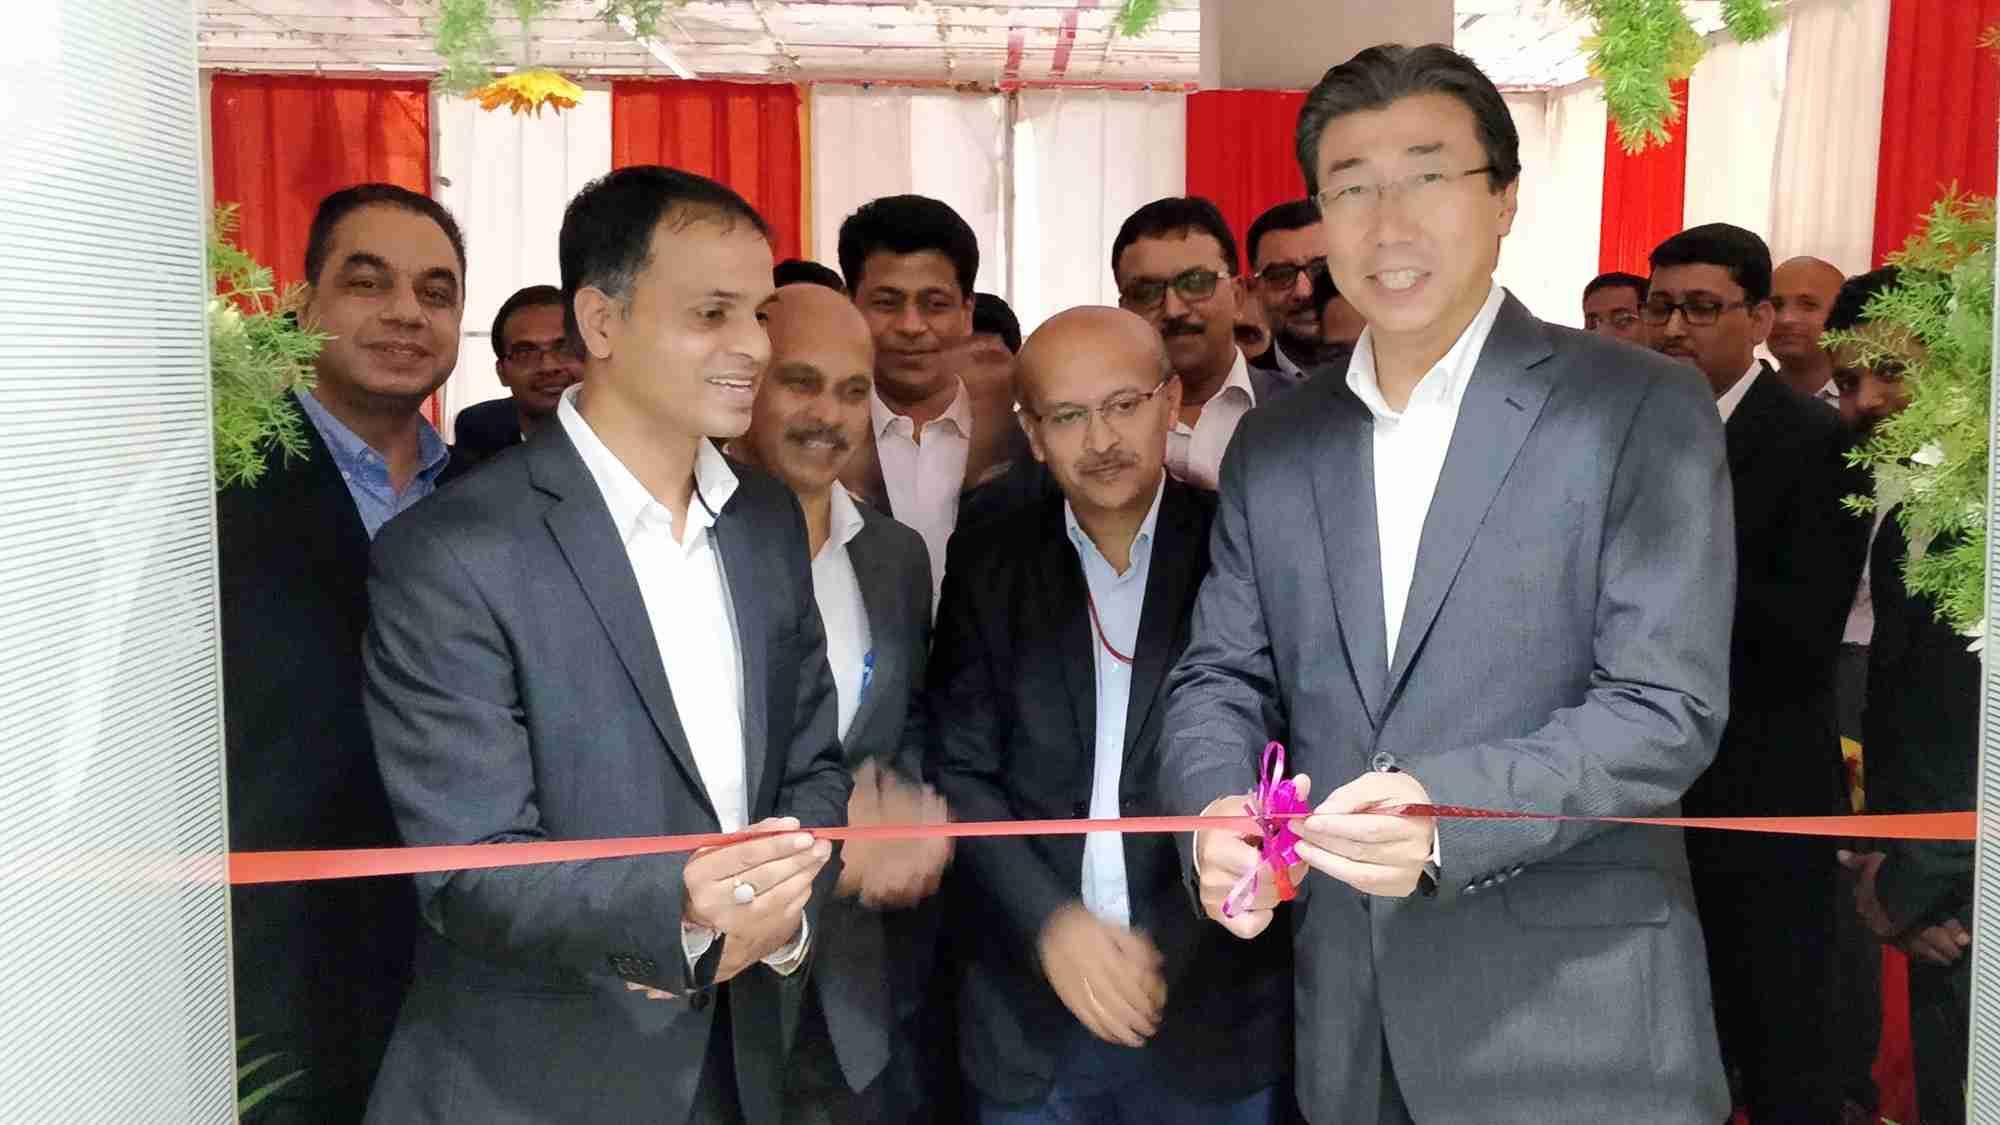 Mr. Minoru Kato - president & CEO, Honda Motorcycle & Scooter India Pvt